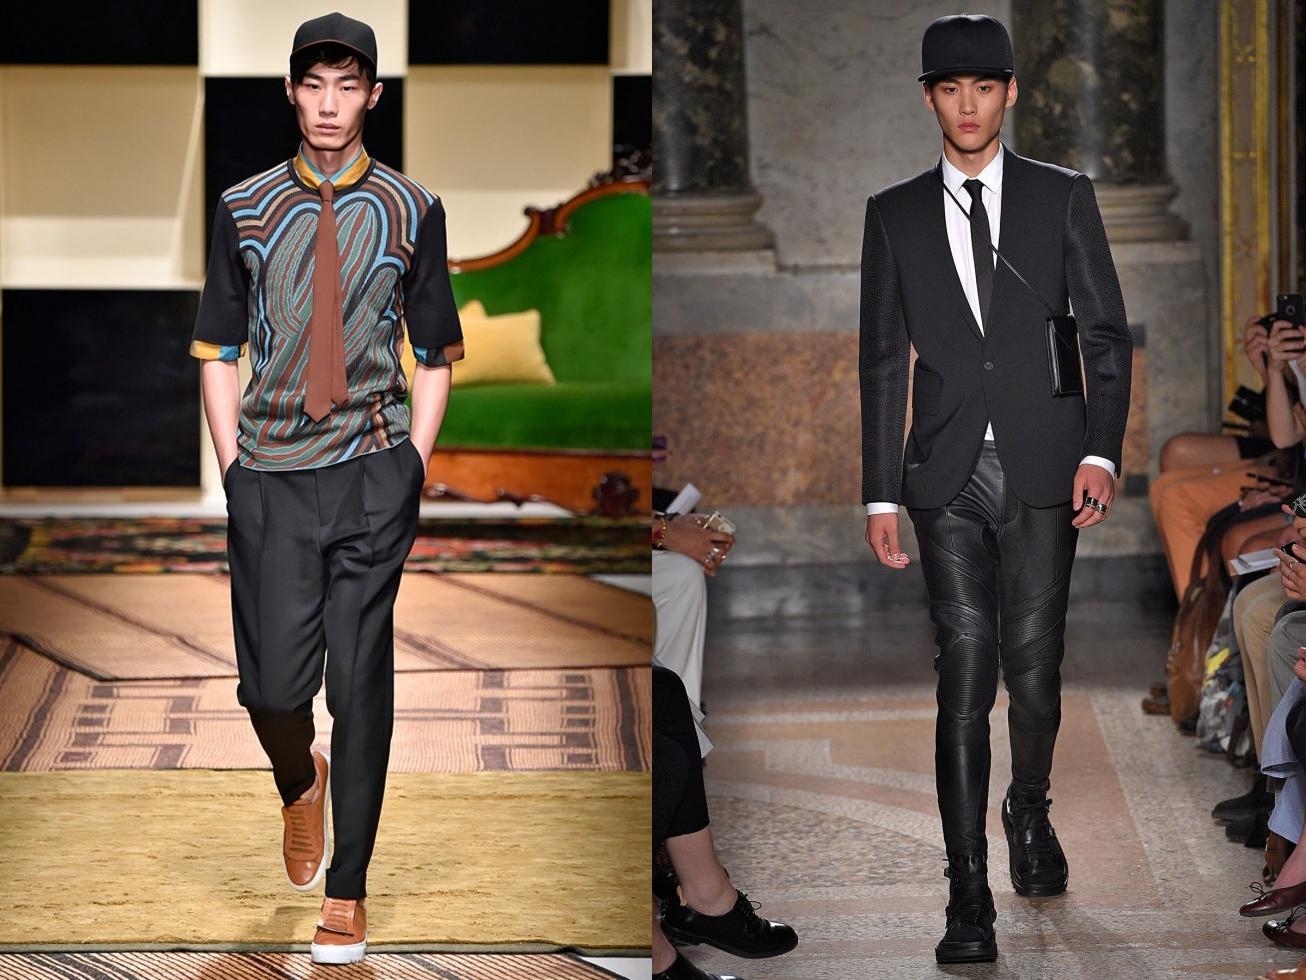 tendencia masculina, moda masculina, menswear, fashion blogger, blogueiro de moda, milan fashion week, trends, verão 2016, summer 2016, alex cursino, moda sem censura, 5